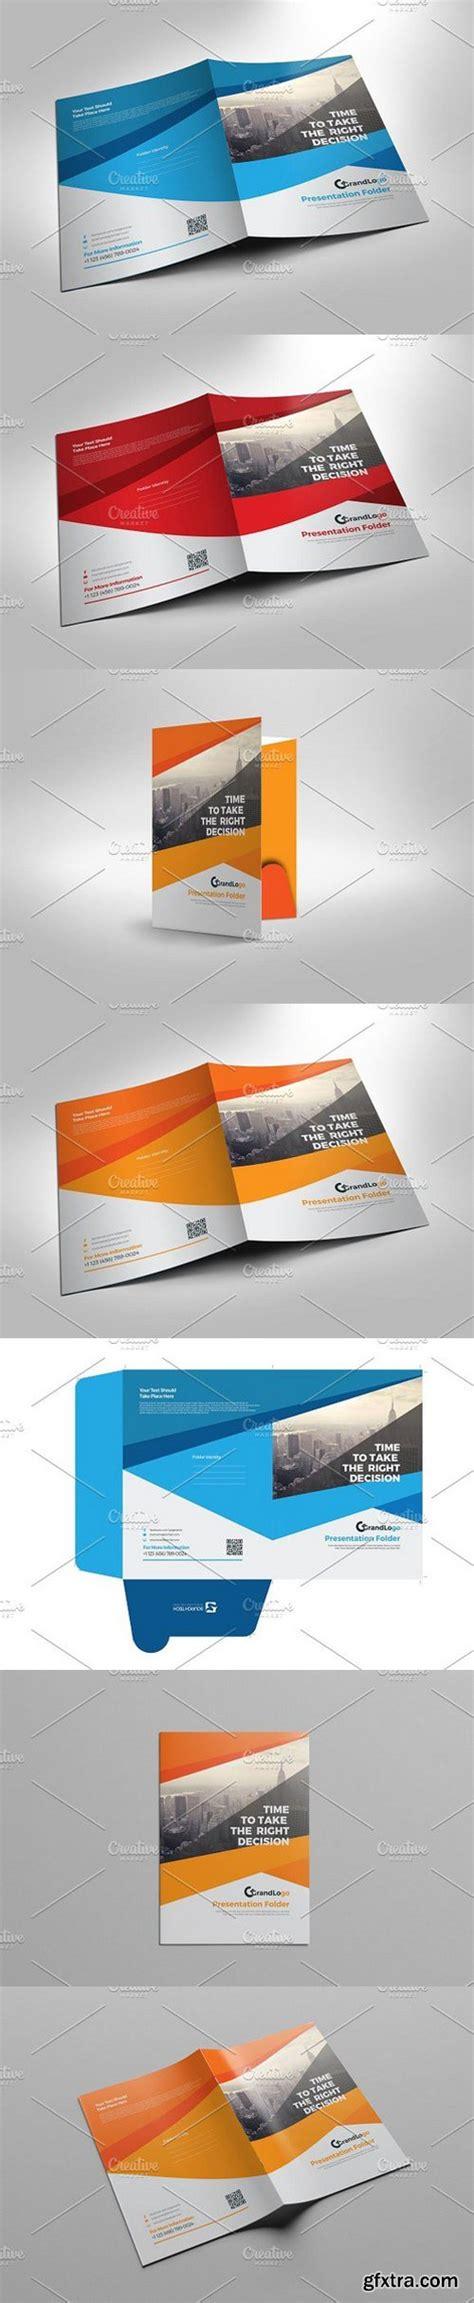 presentation folder templates cm presentation folder template 1151739 187 vector